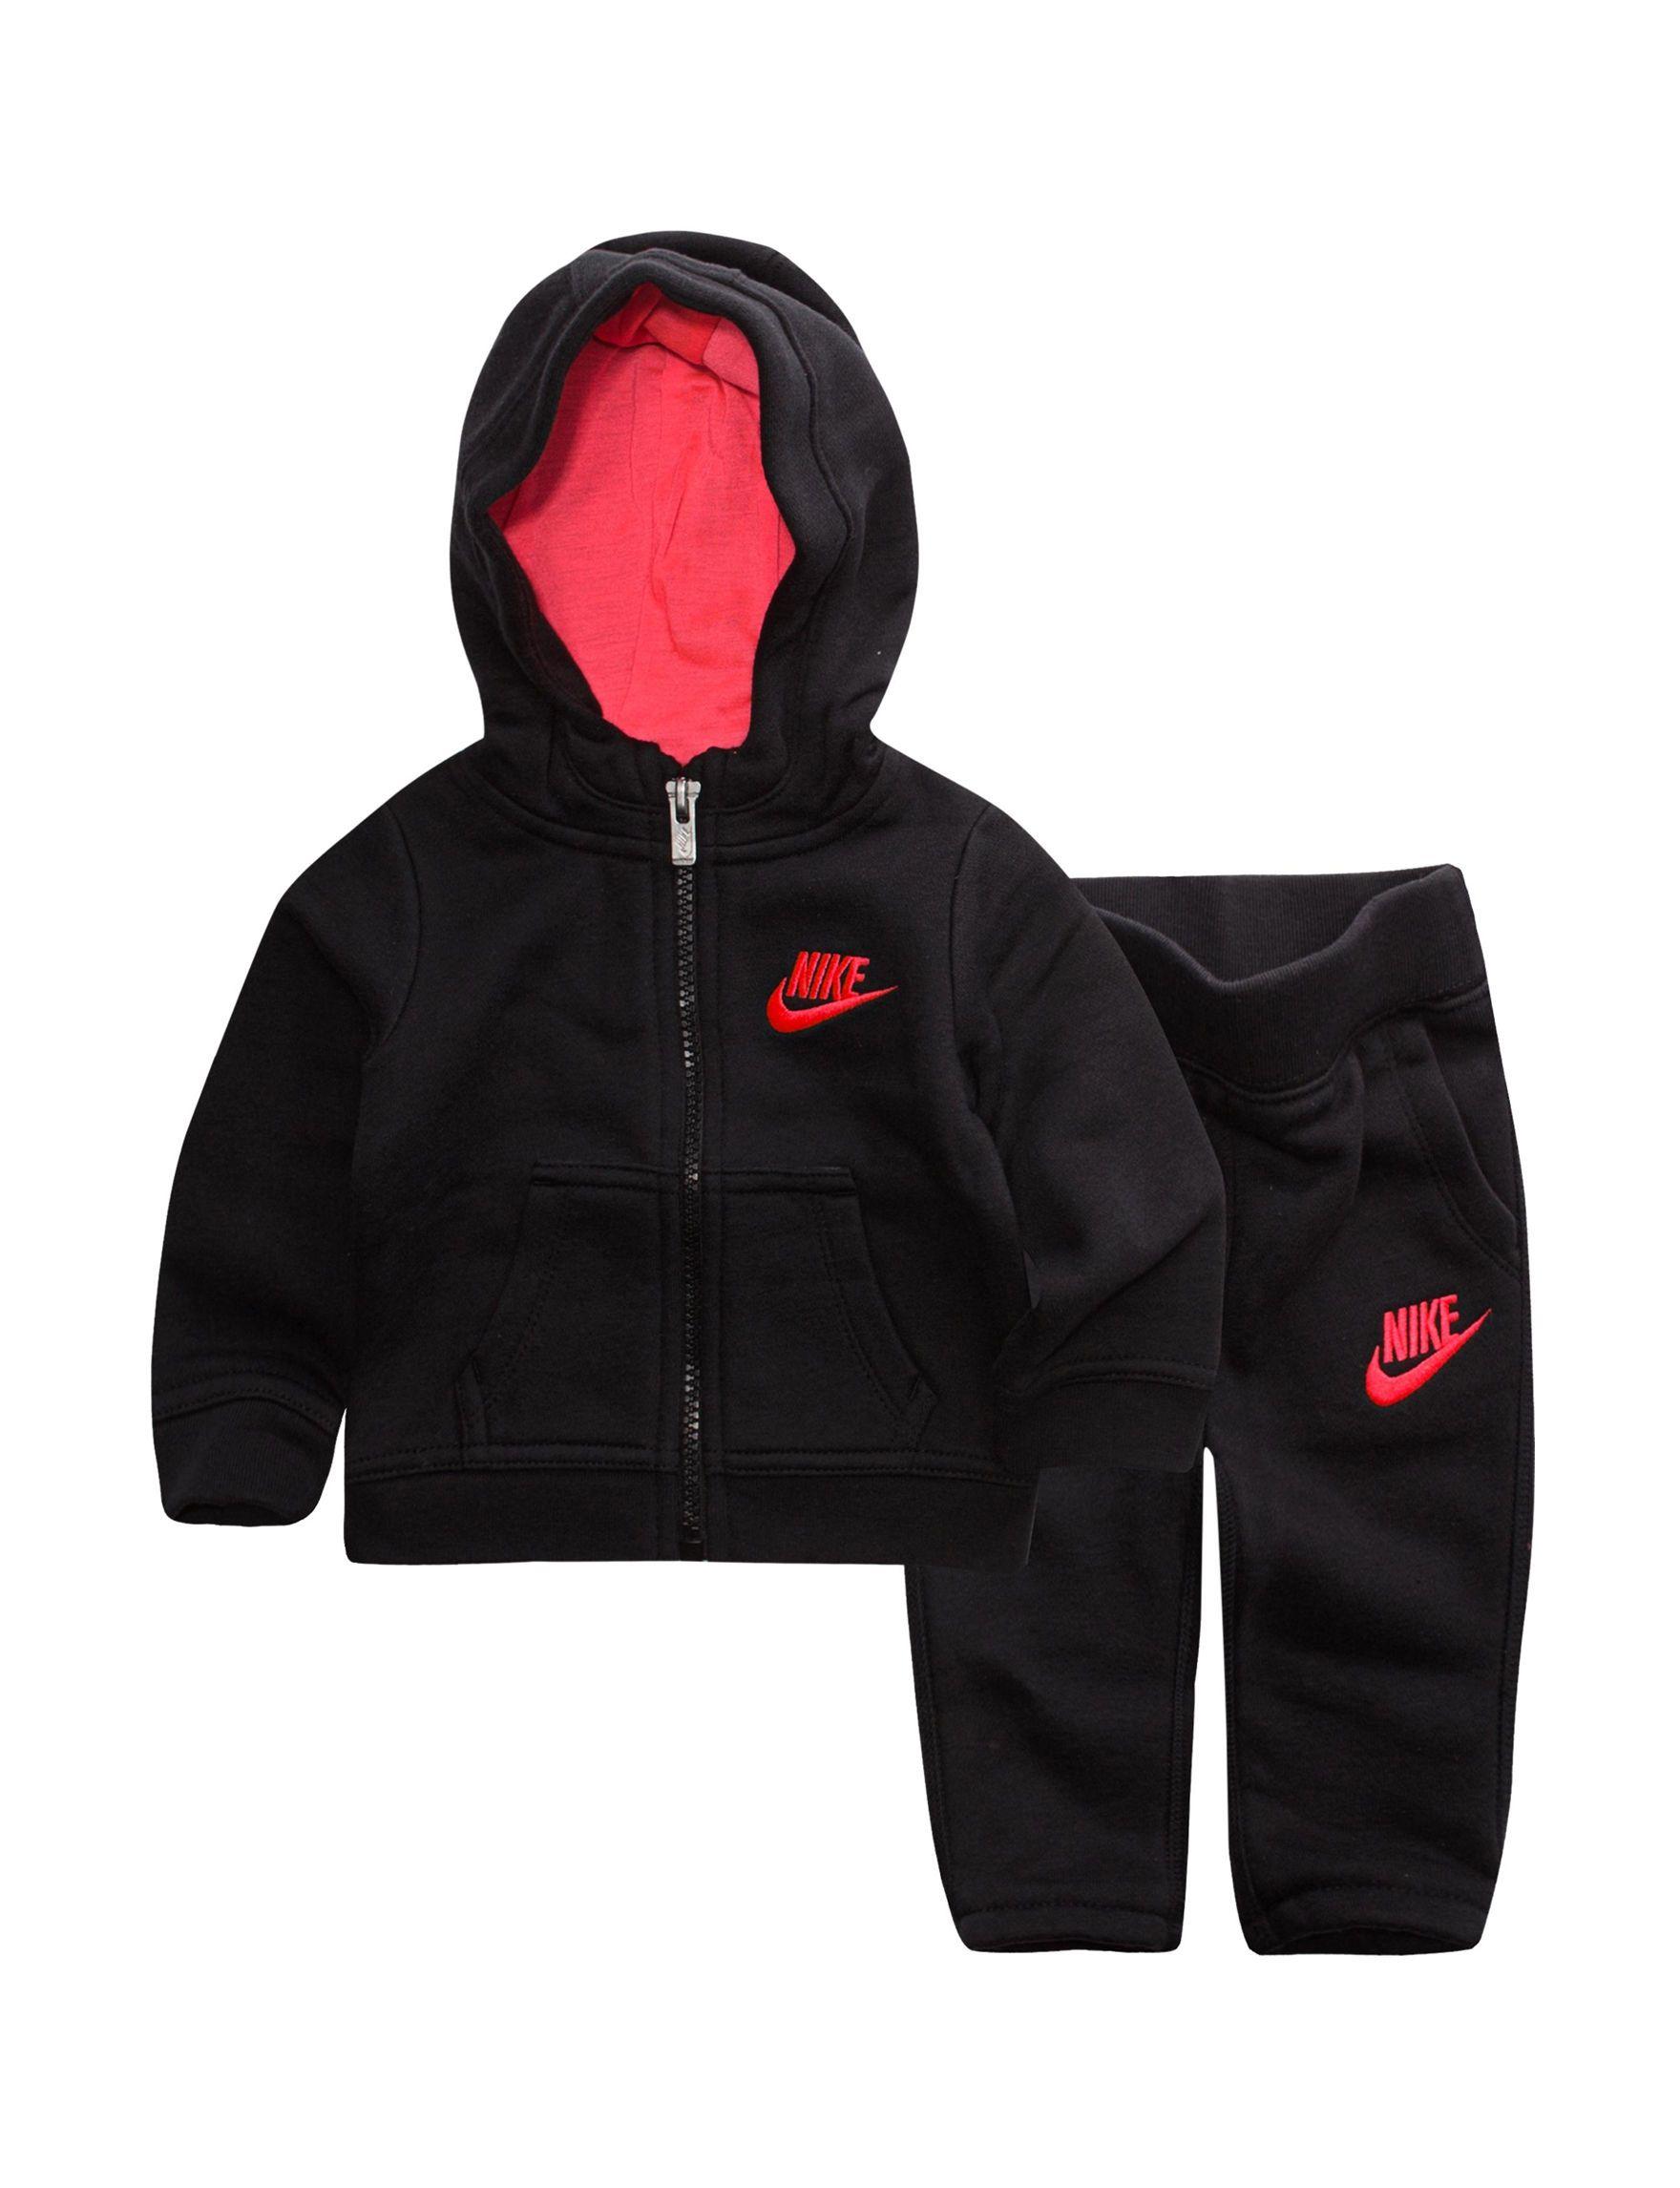 1d2baca21d66 Nike 2-pc. Futura Fleece Hoodie   Pants Set - Baby 12-24 Mos ...